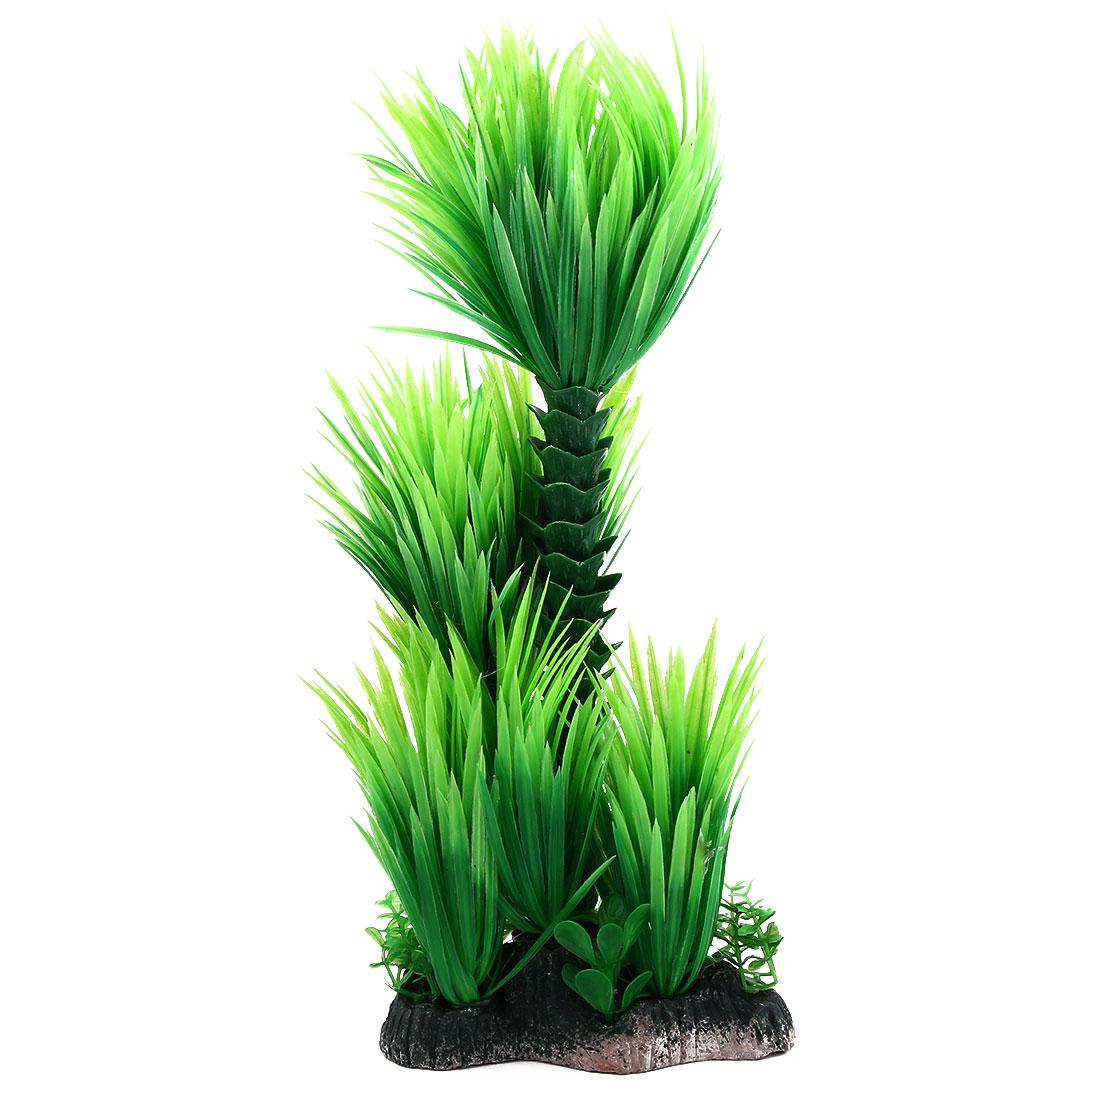 Aquarium Ceramic Base Artificial Underwater Landscape Grass Plant Green 28cm Height